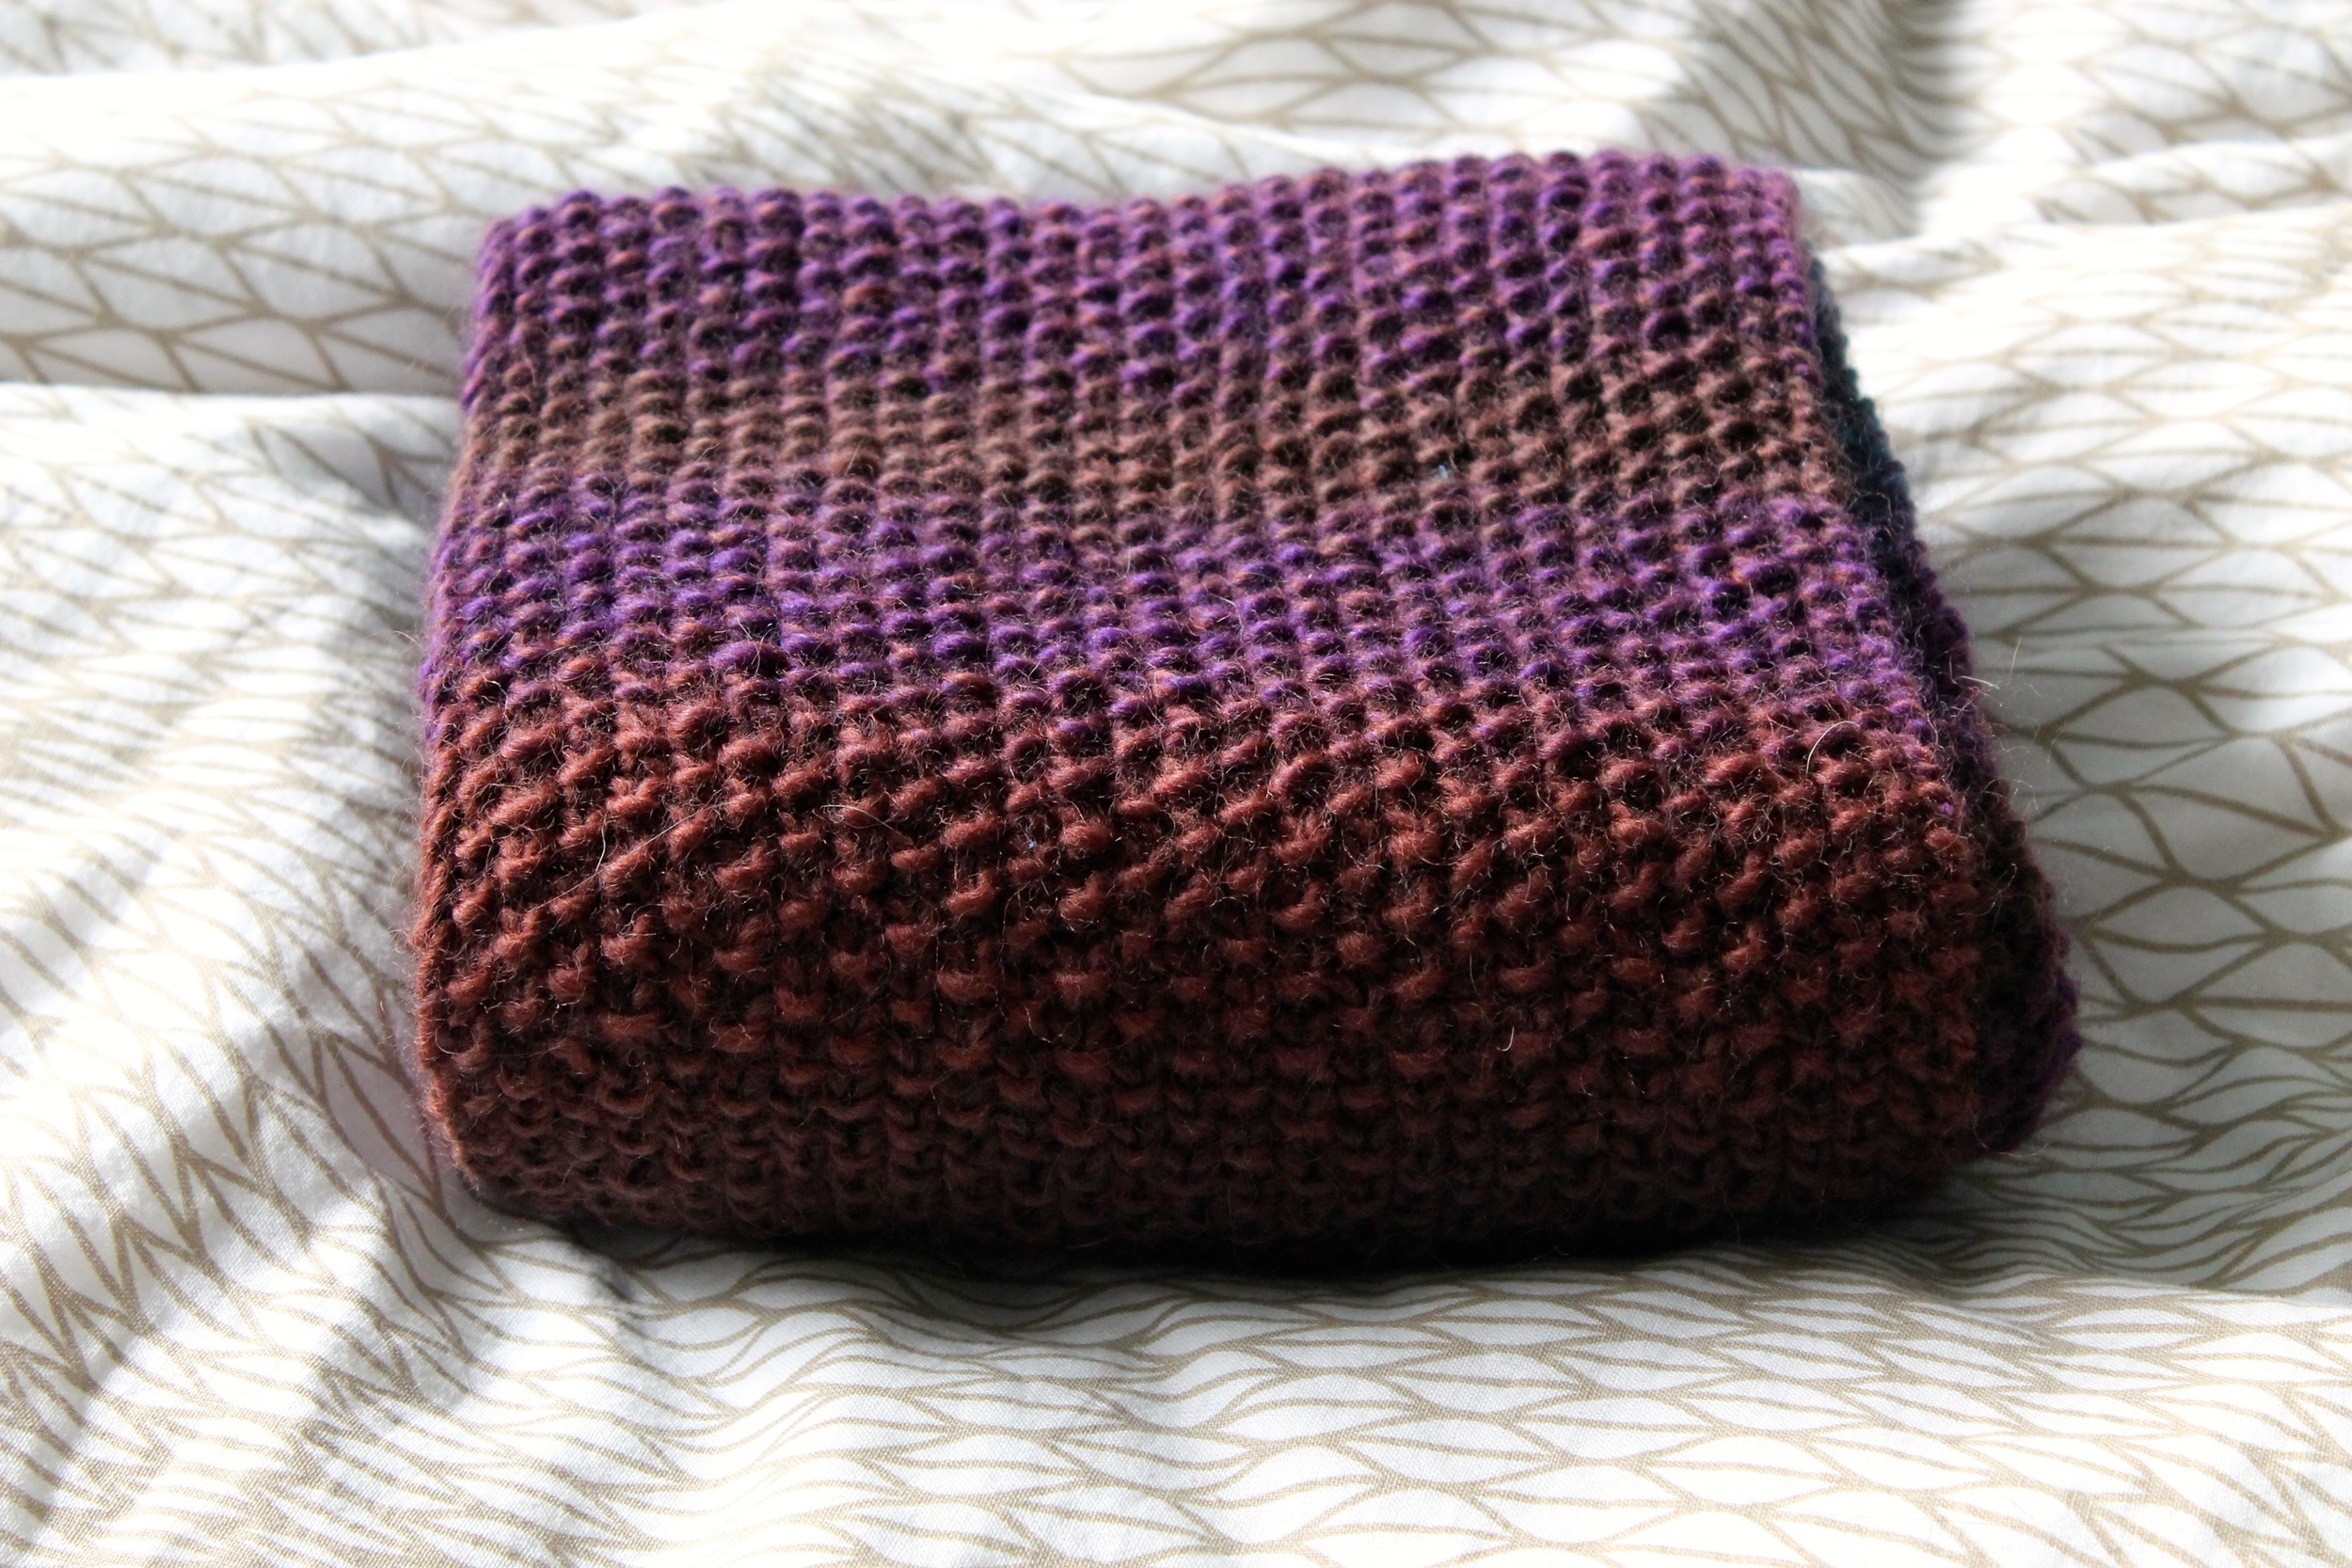 100% wool knit scarf in variegated Nashua Handknits yarn